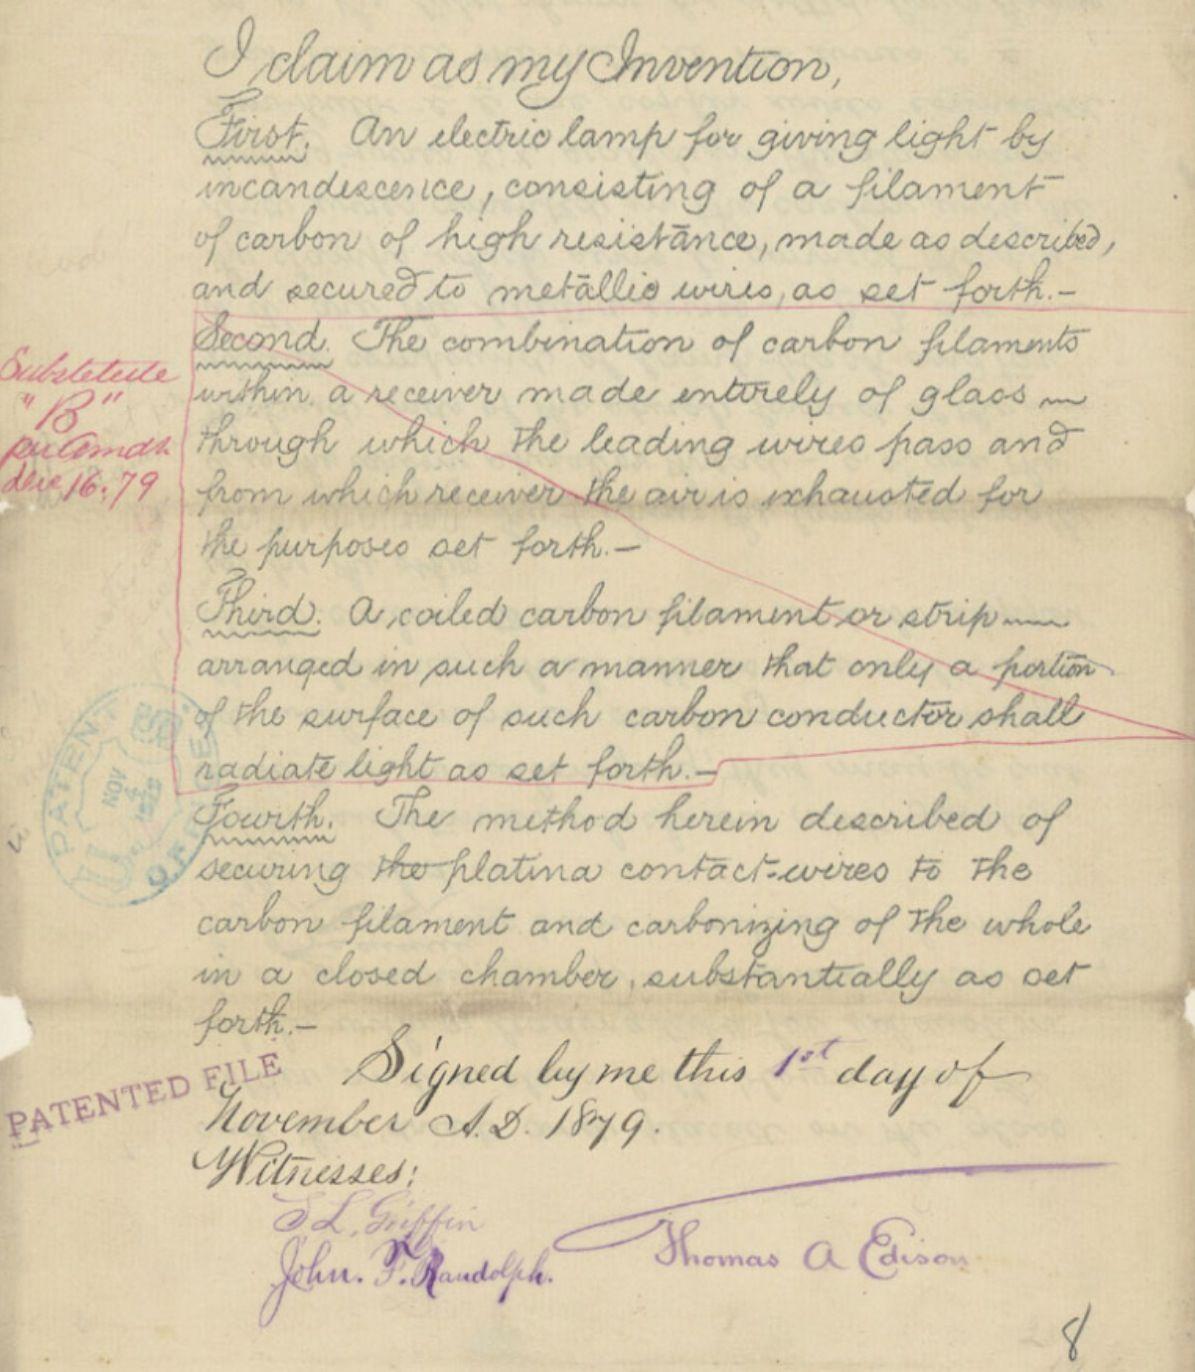 Primary Source Document On November 1 Thomas